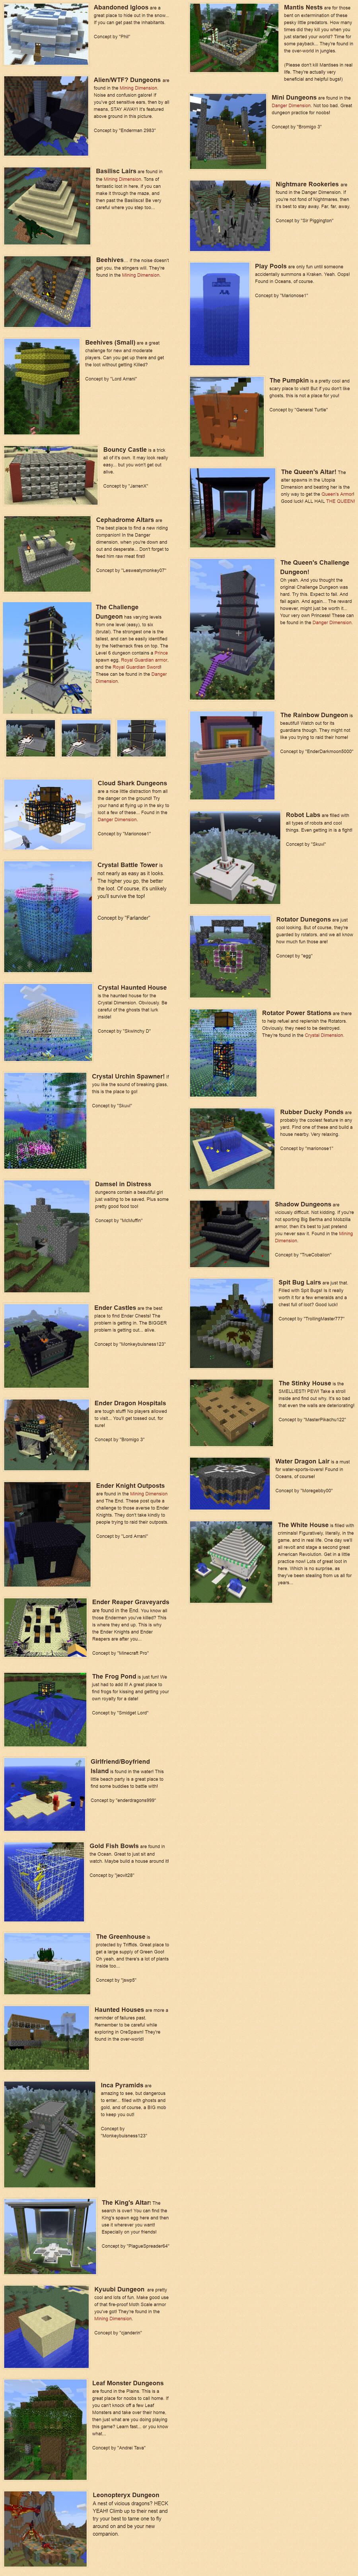 OreSpawn-Mod-Dungeons.jpg